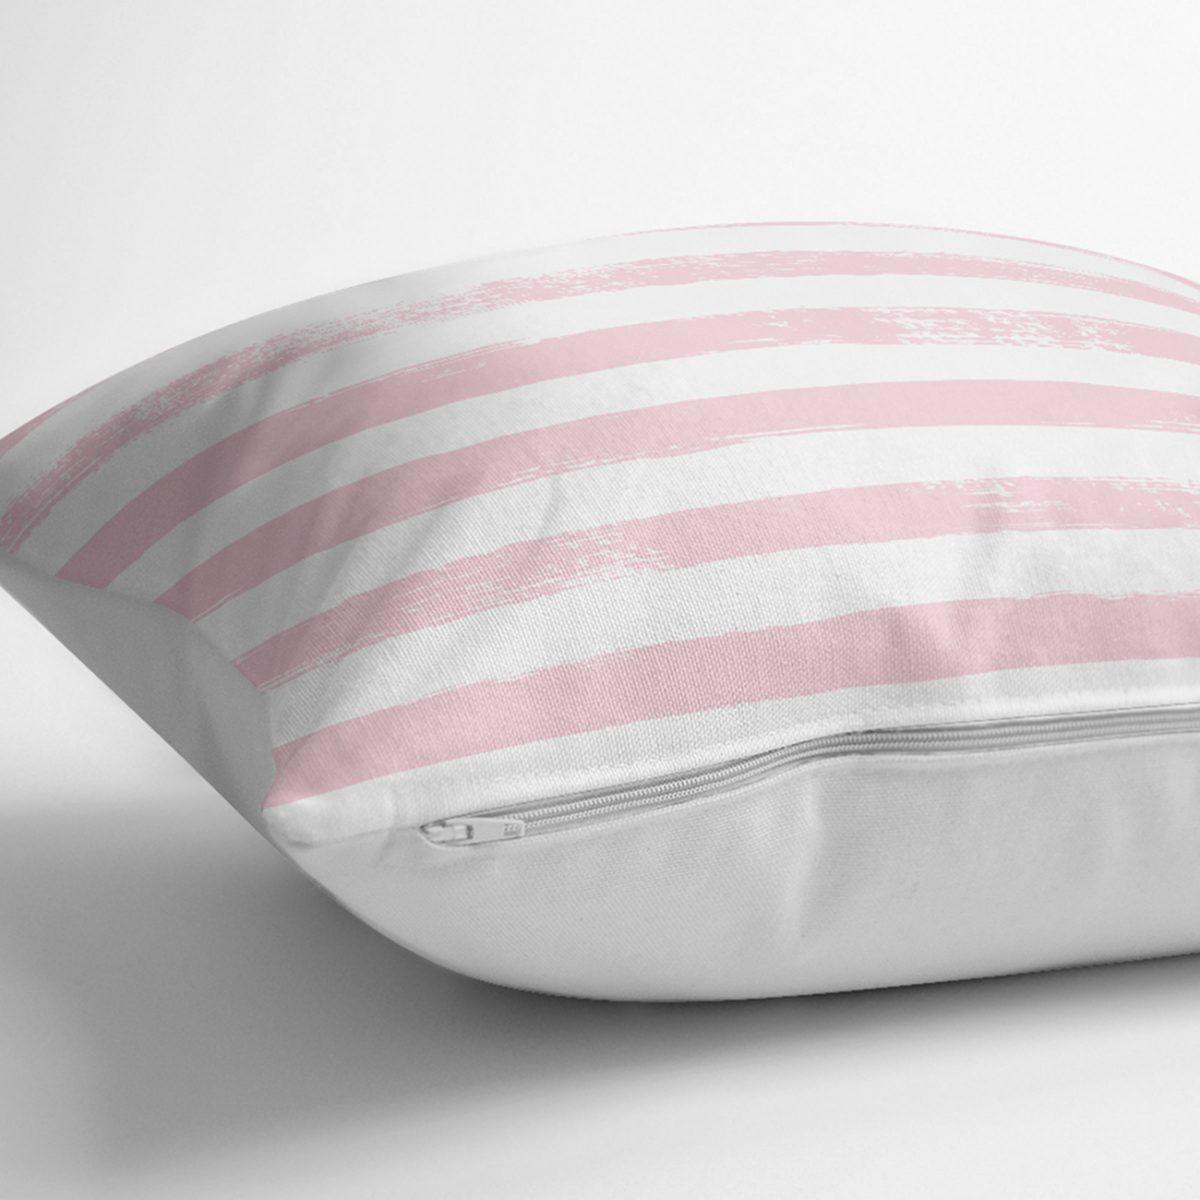 Pembe Çizgili Motifli Dekoratif Modern Yastık Kılıfı Realhomes